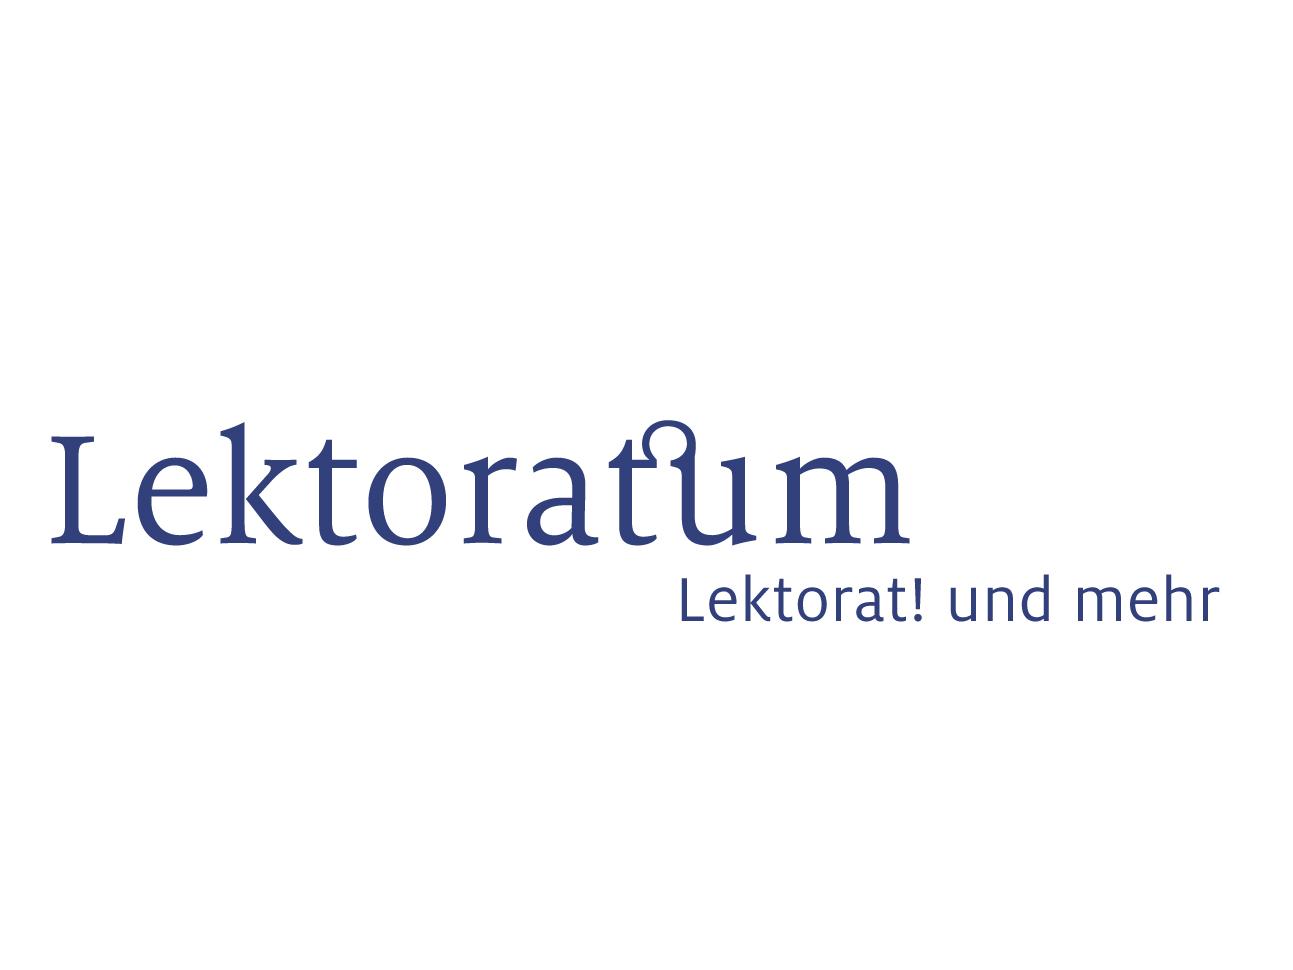 martin_zech_design_corporate_design_lektoratum_logo